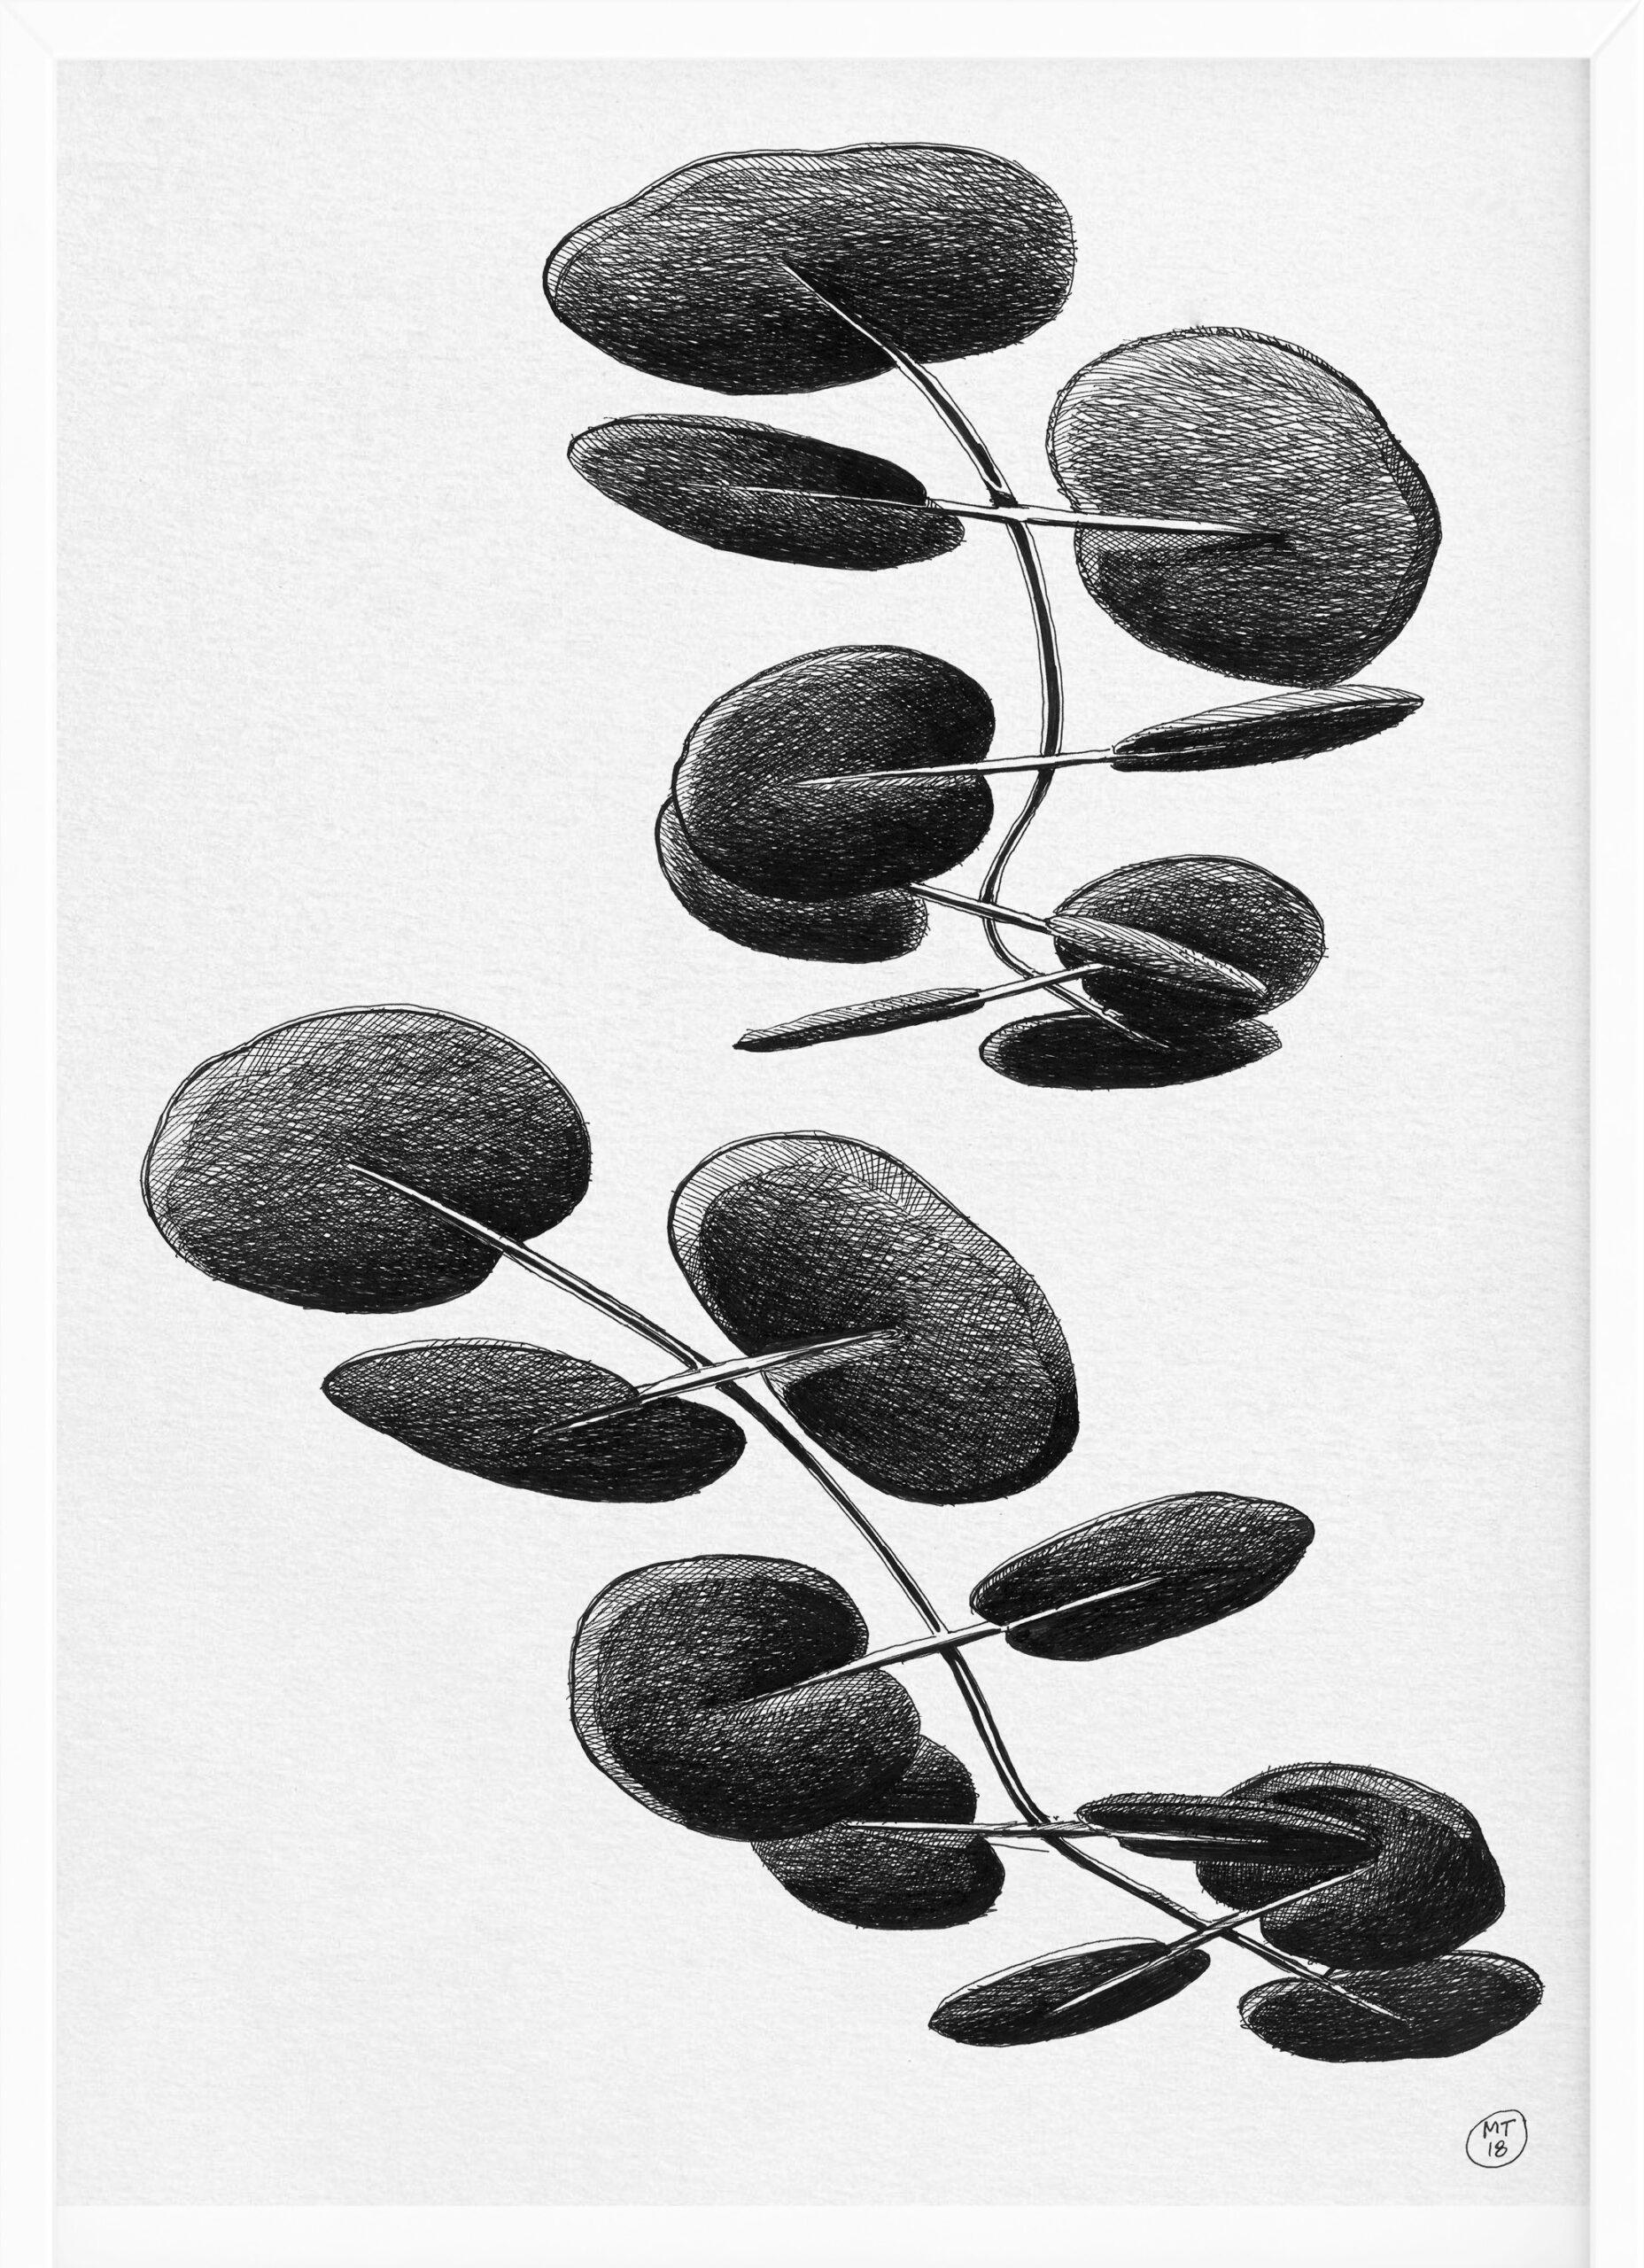 Radical | Drawings | Mario Trimarchi Design9